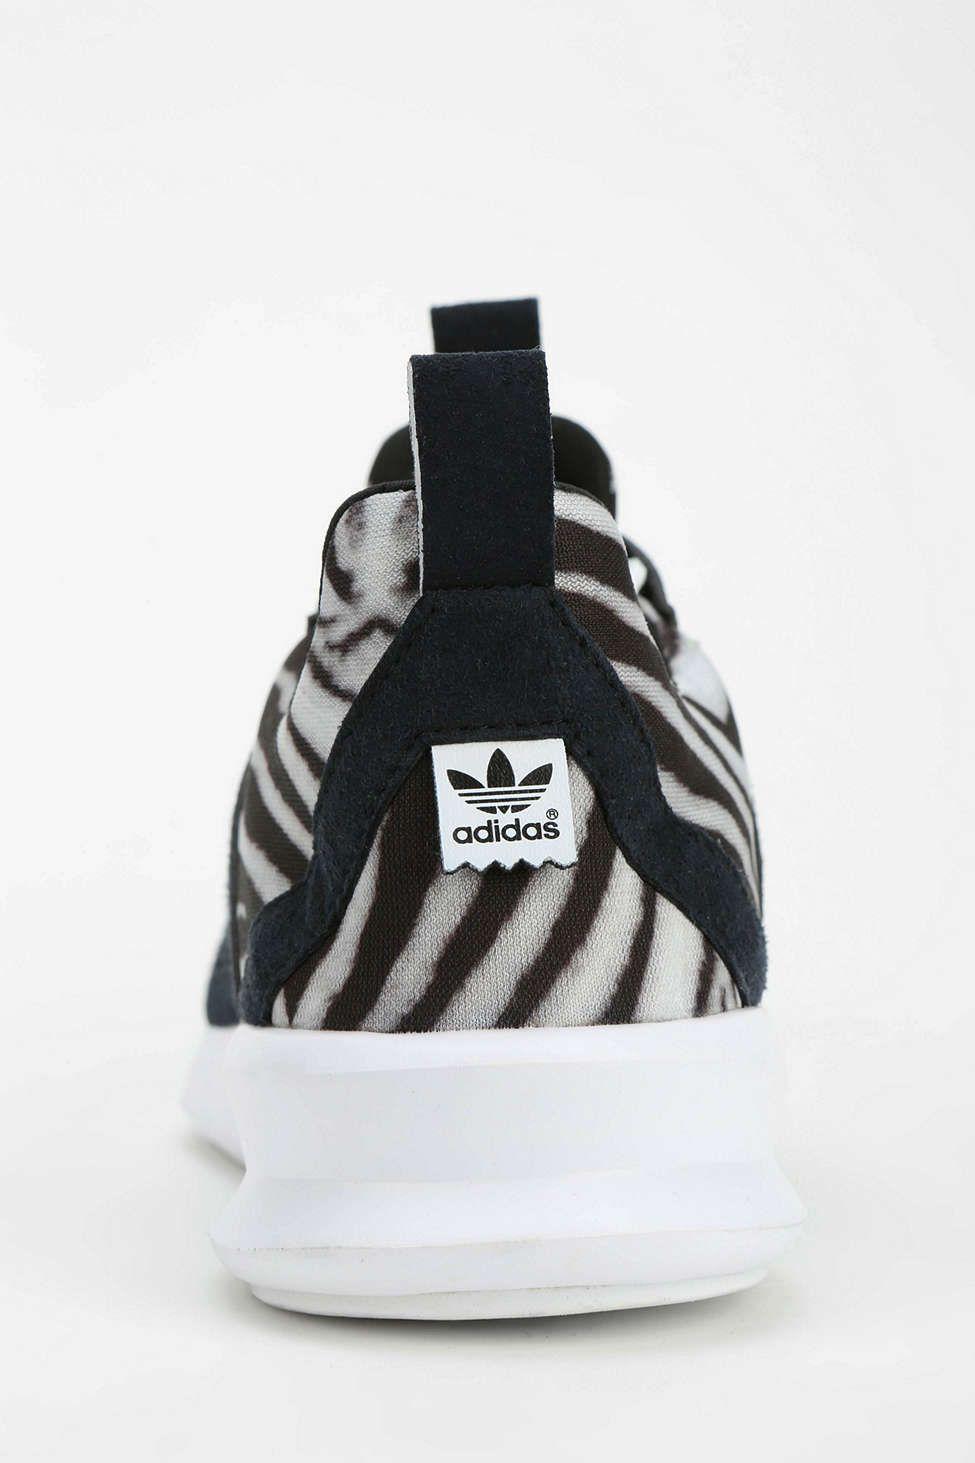 best website 6654d 2e8c9 Adidas sneakers adidas